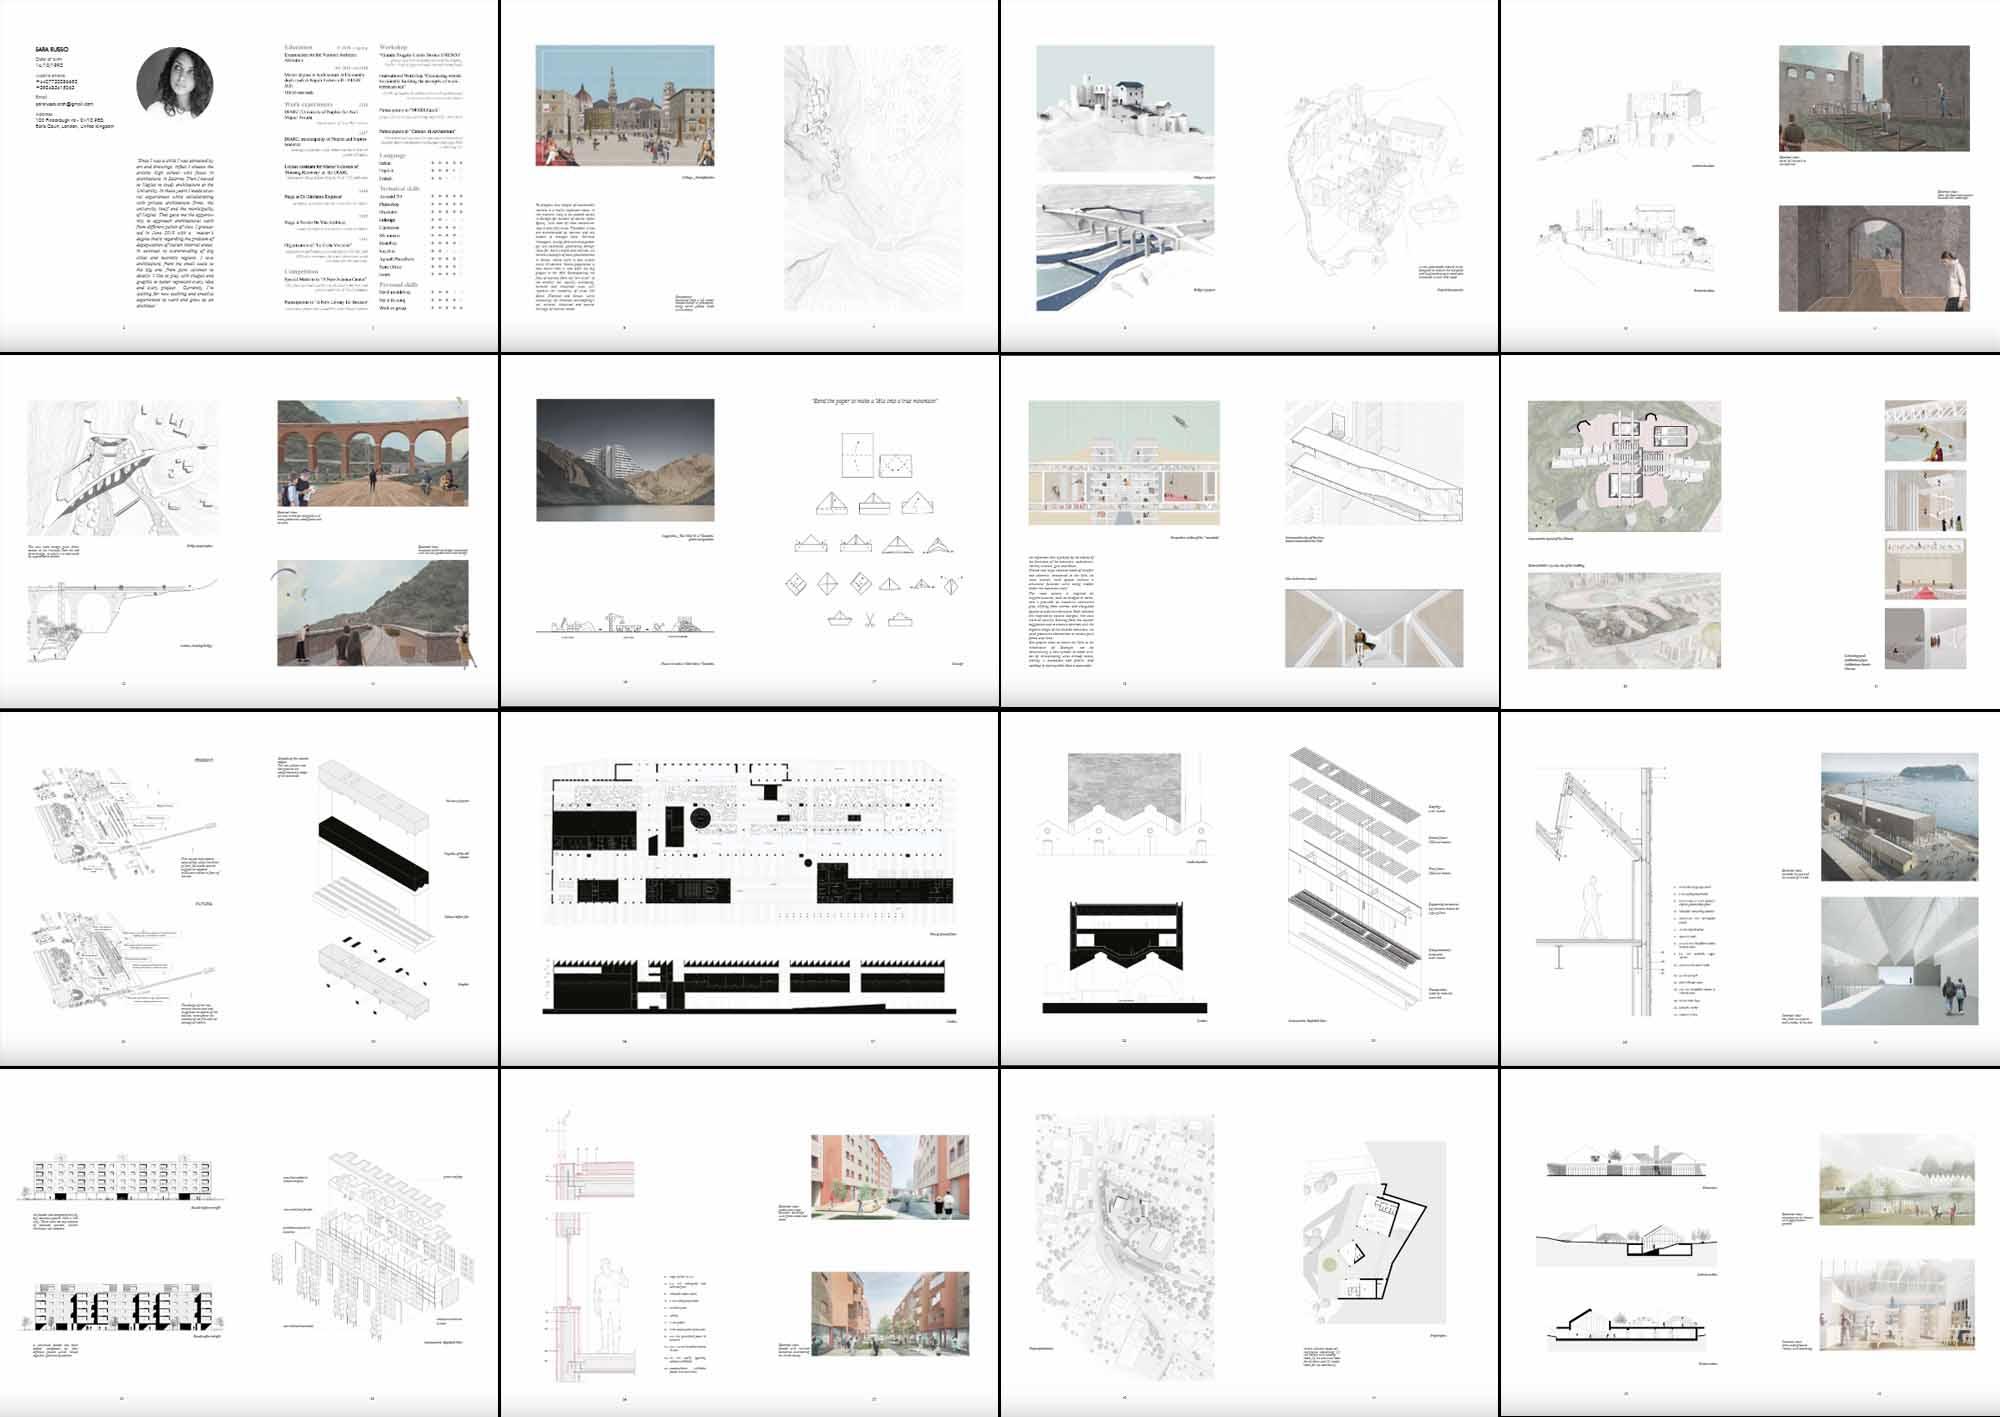 Architecture Portfolio Guide Archisoup Architecture